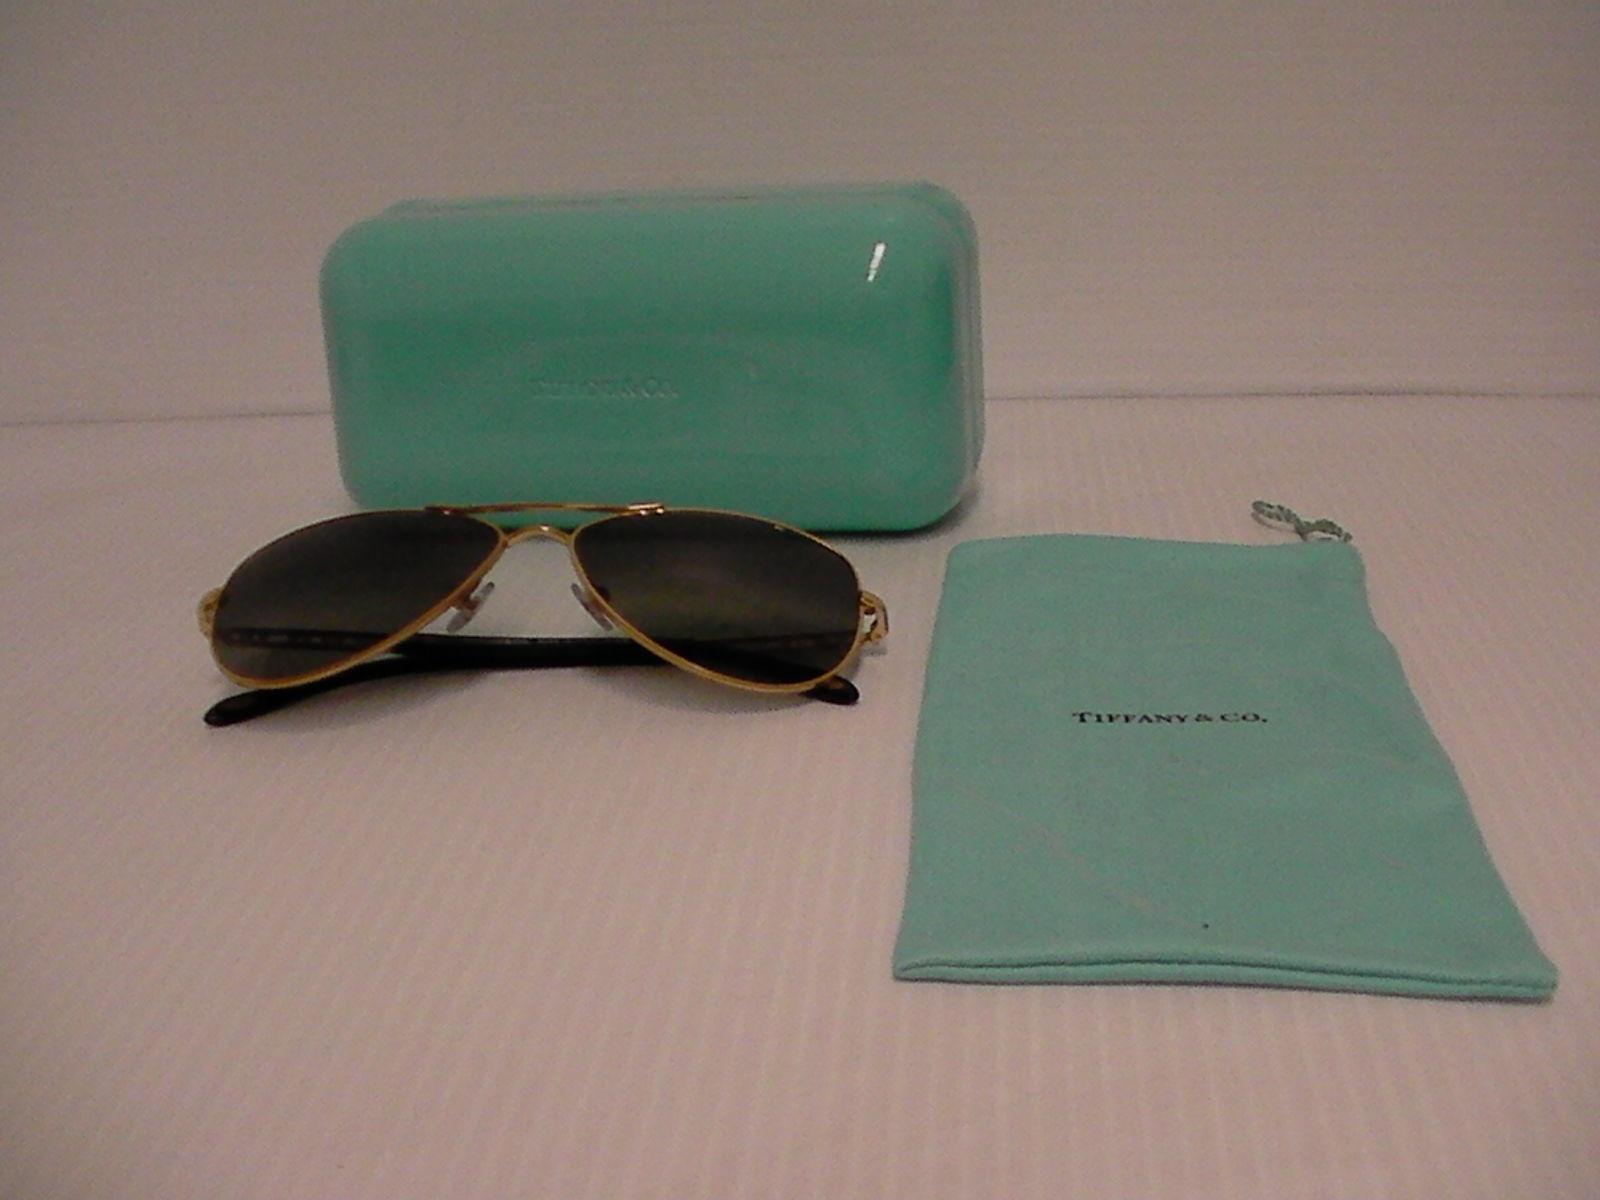 3614f72c64 Authentic tiffany sunglasses TF 3047-K gold and 39 similar items